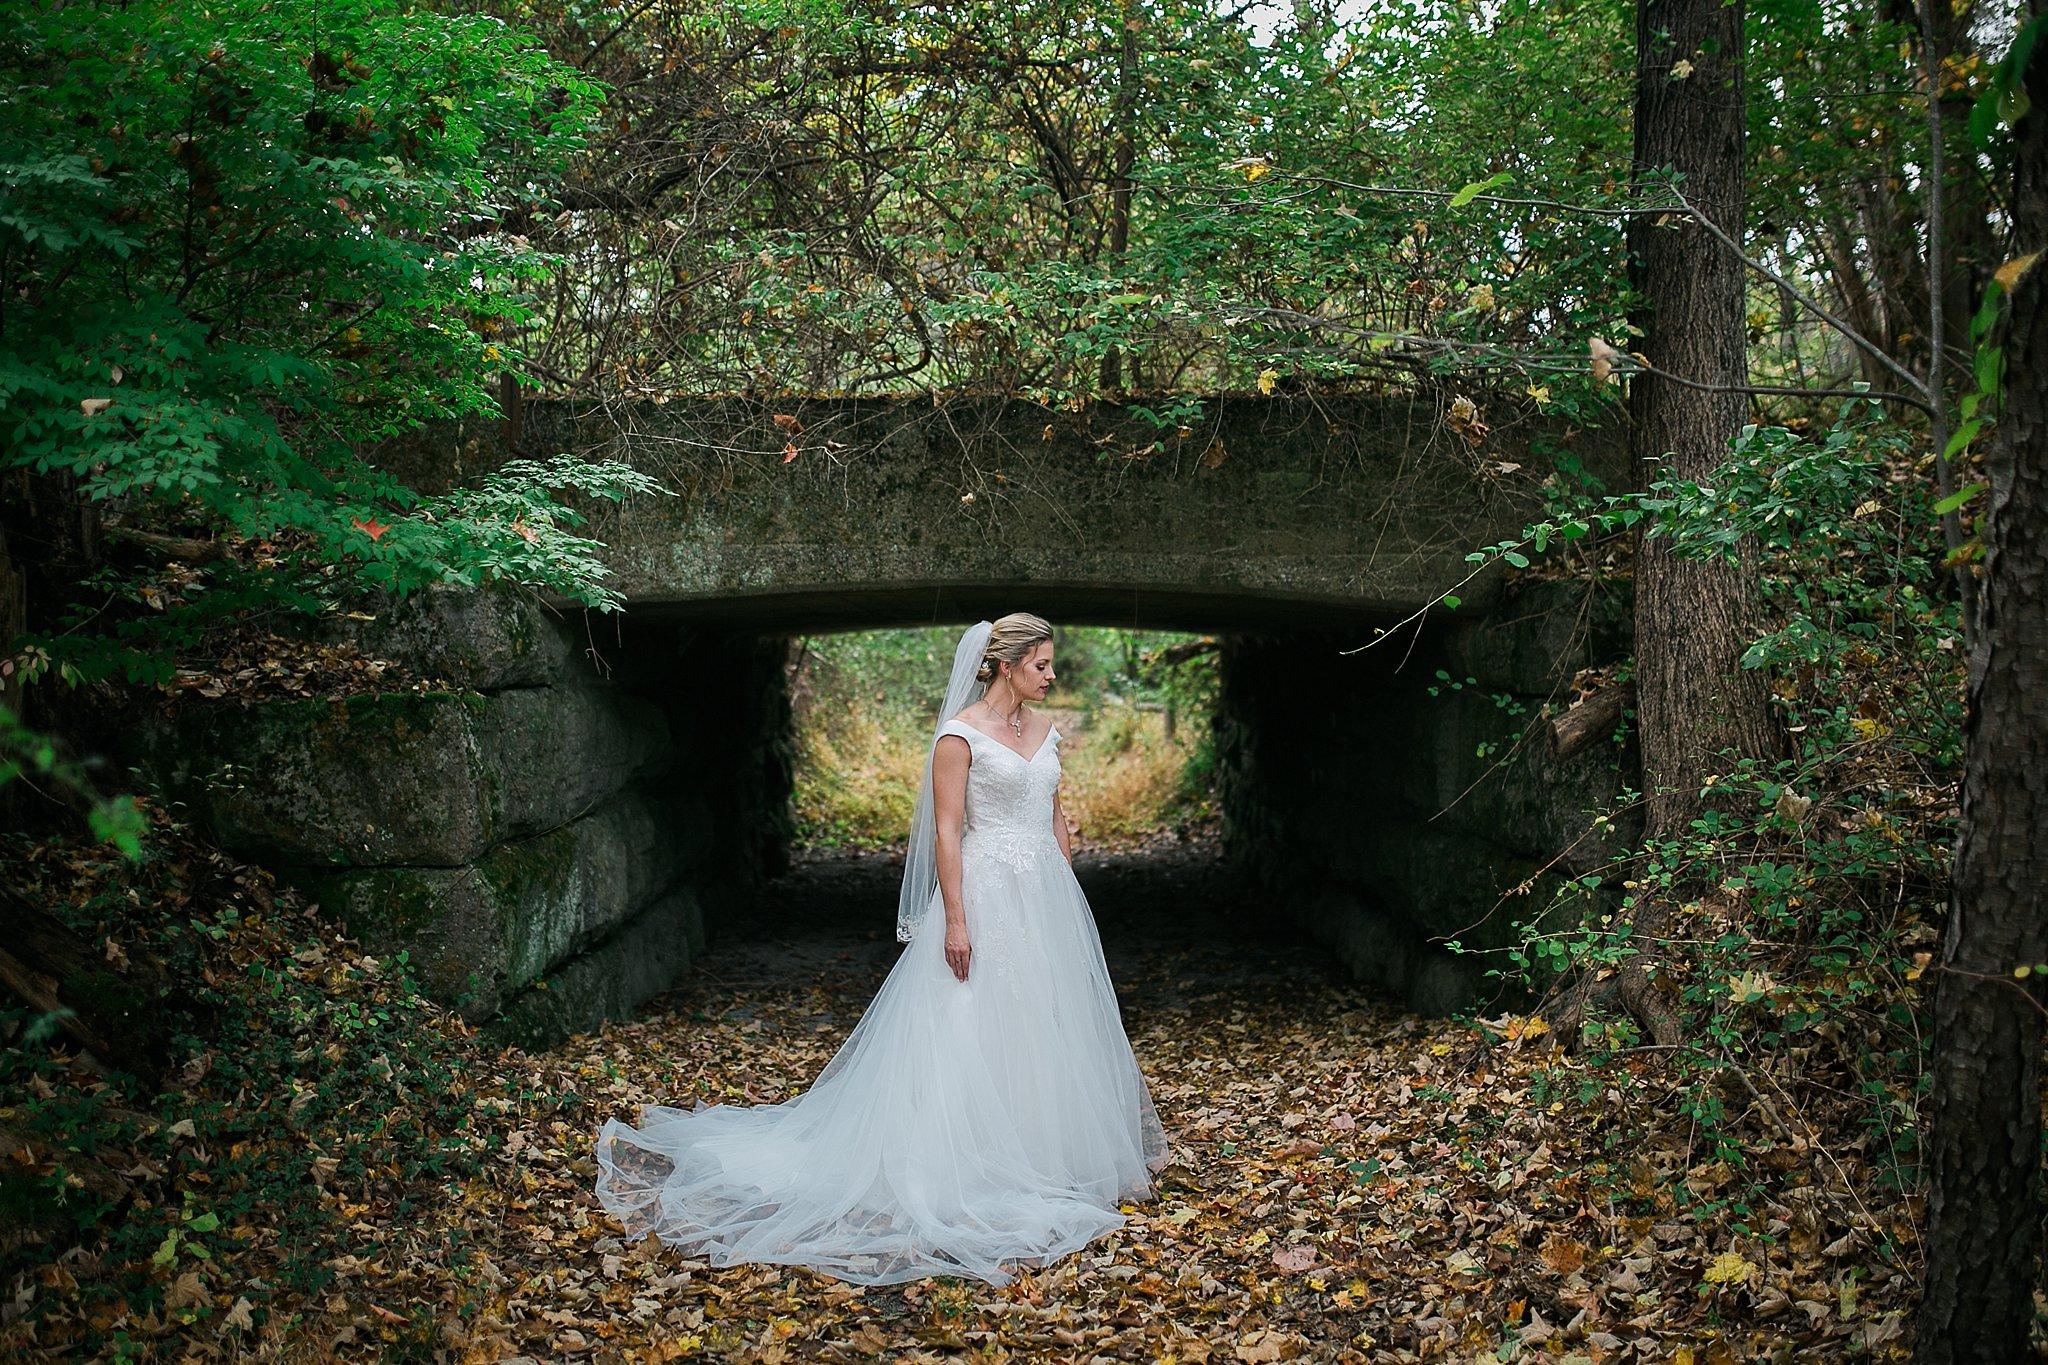 New Windsor New York Hudson Valley New York Wedding Photographer 28.jpg